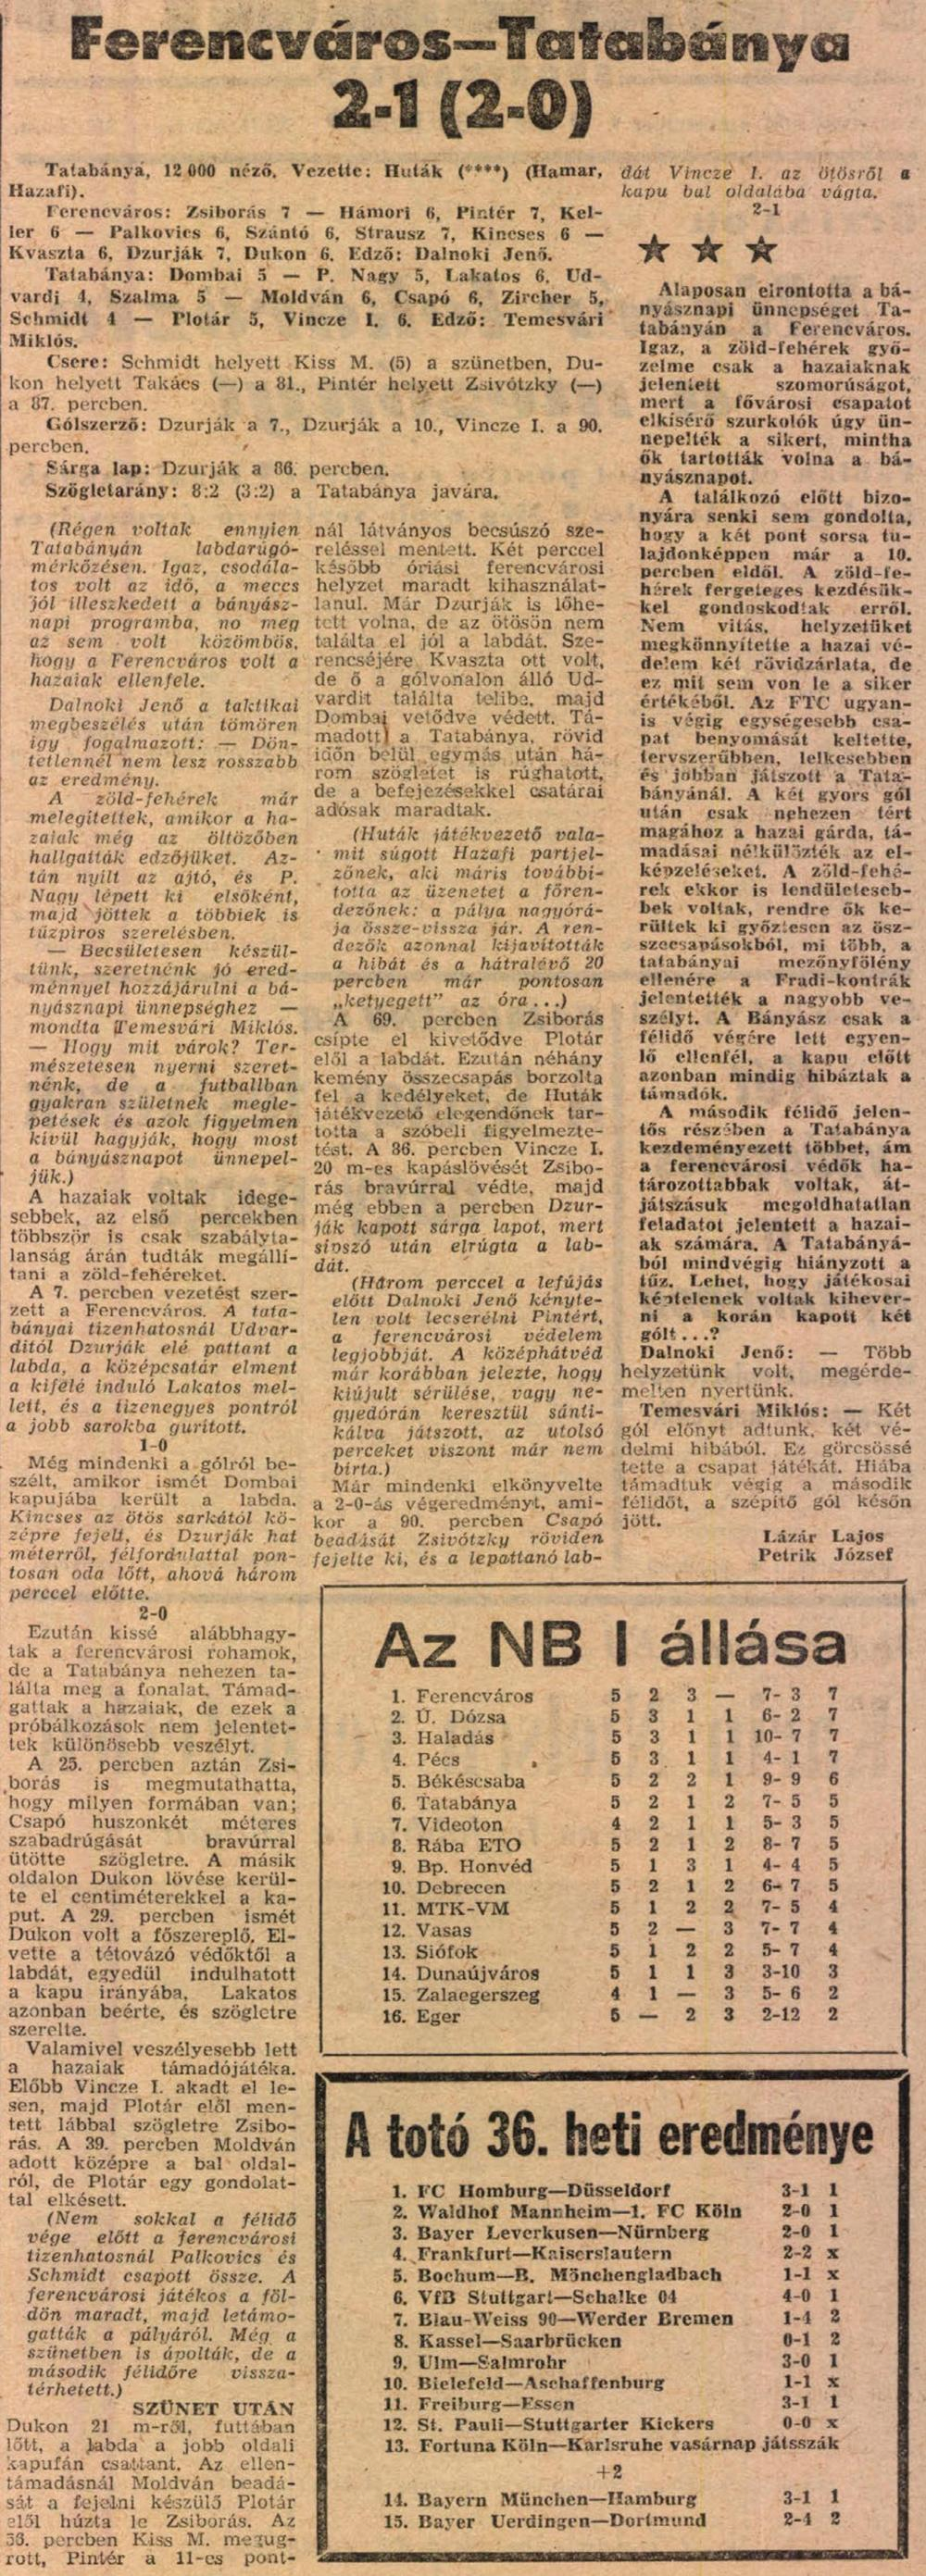 NS-19860907-02-19860906